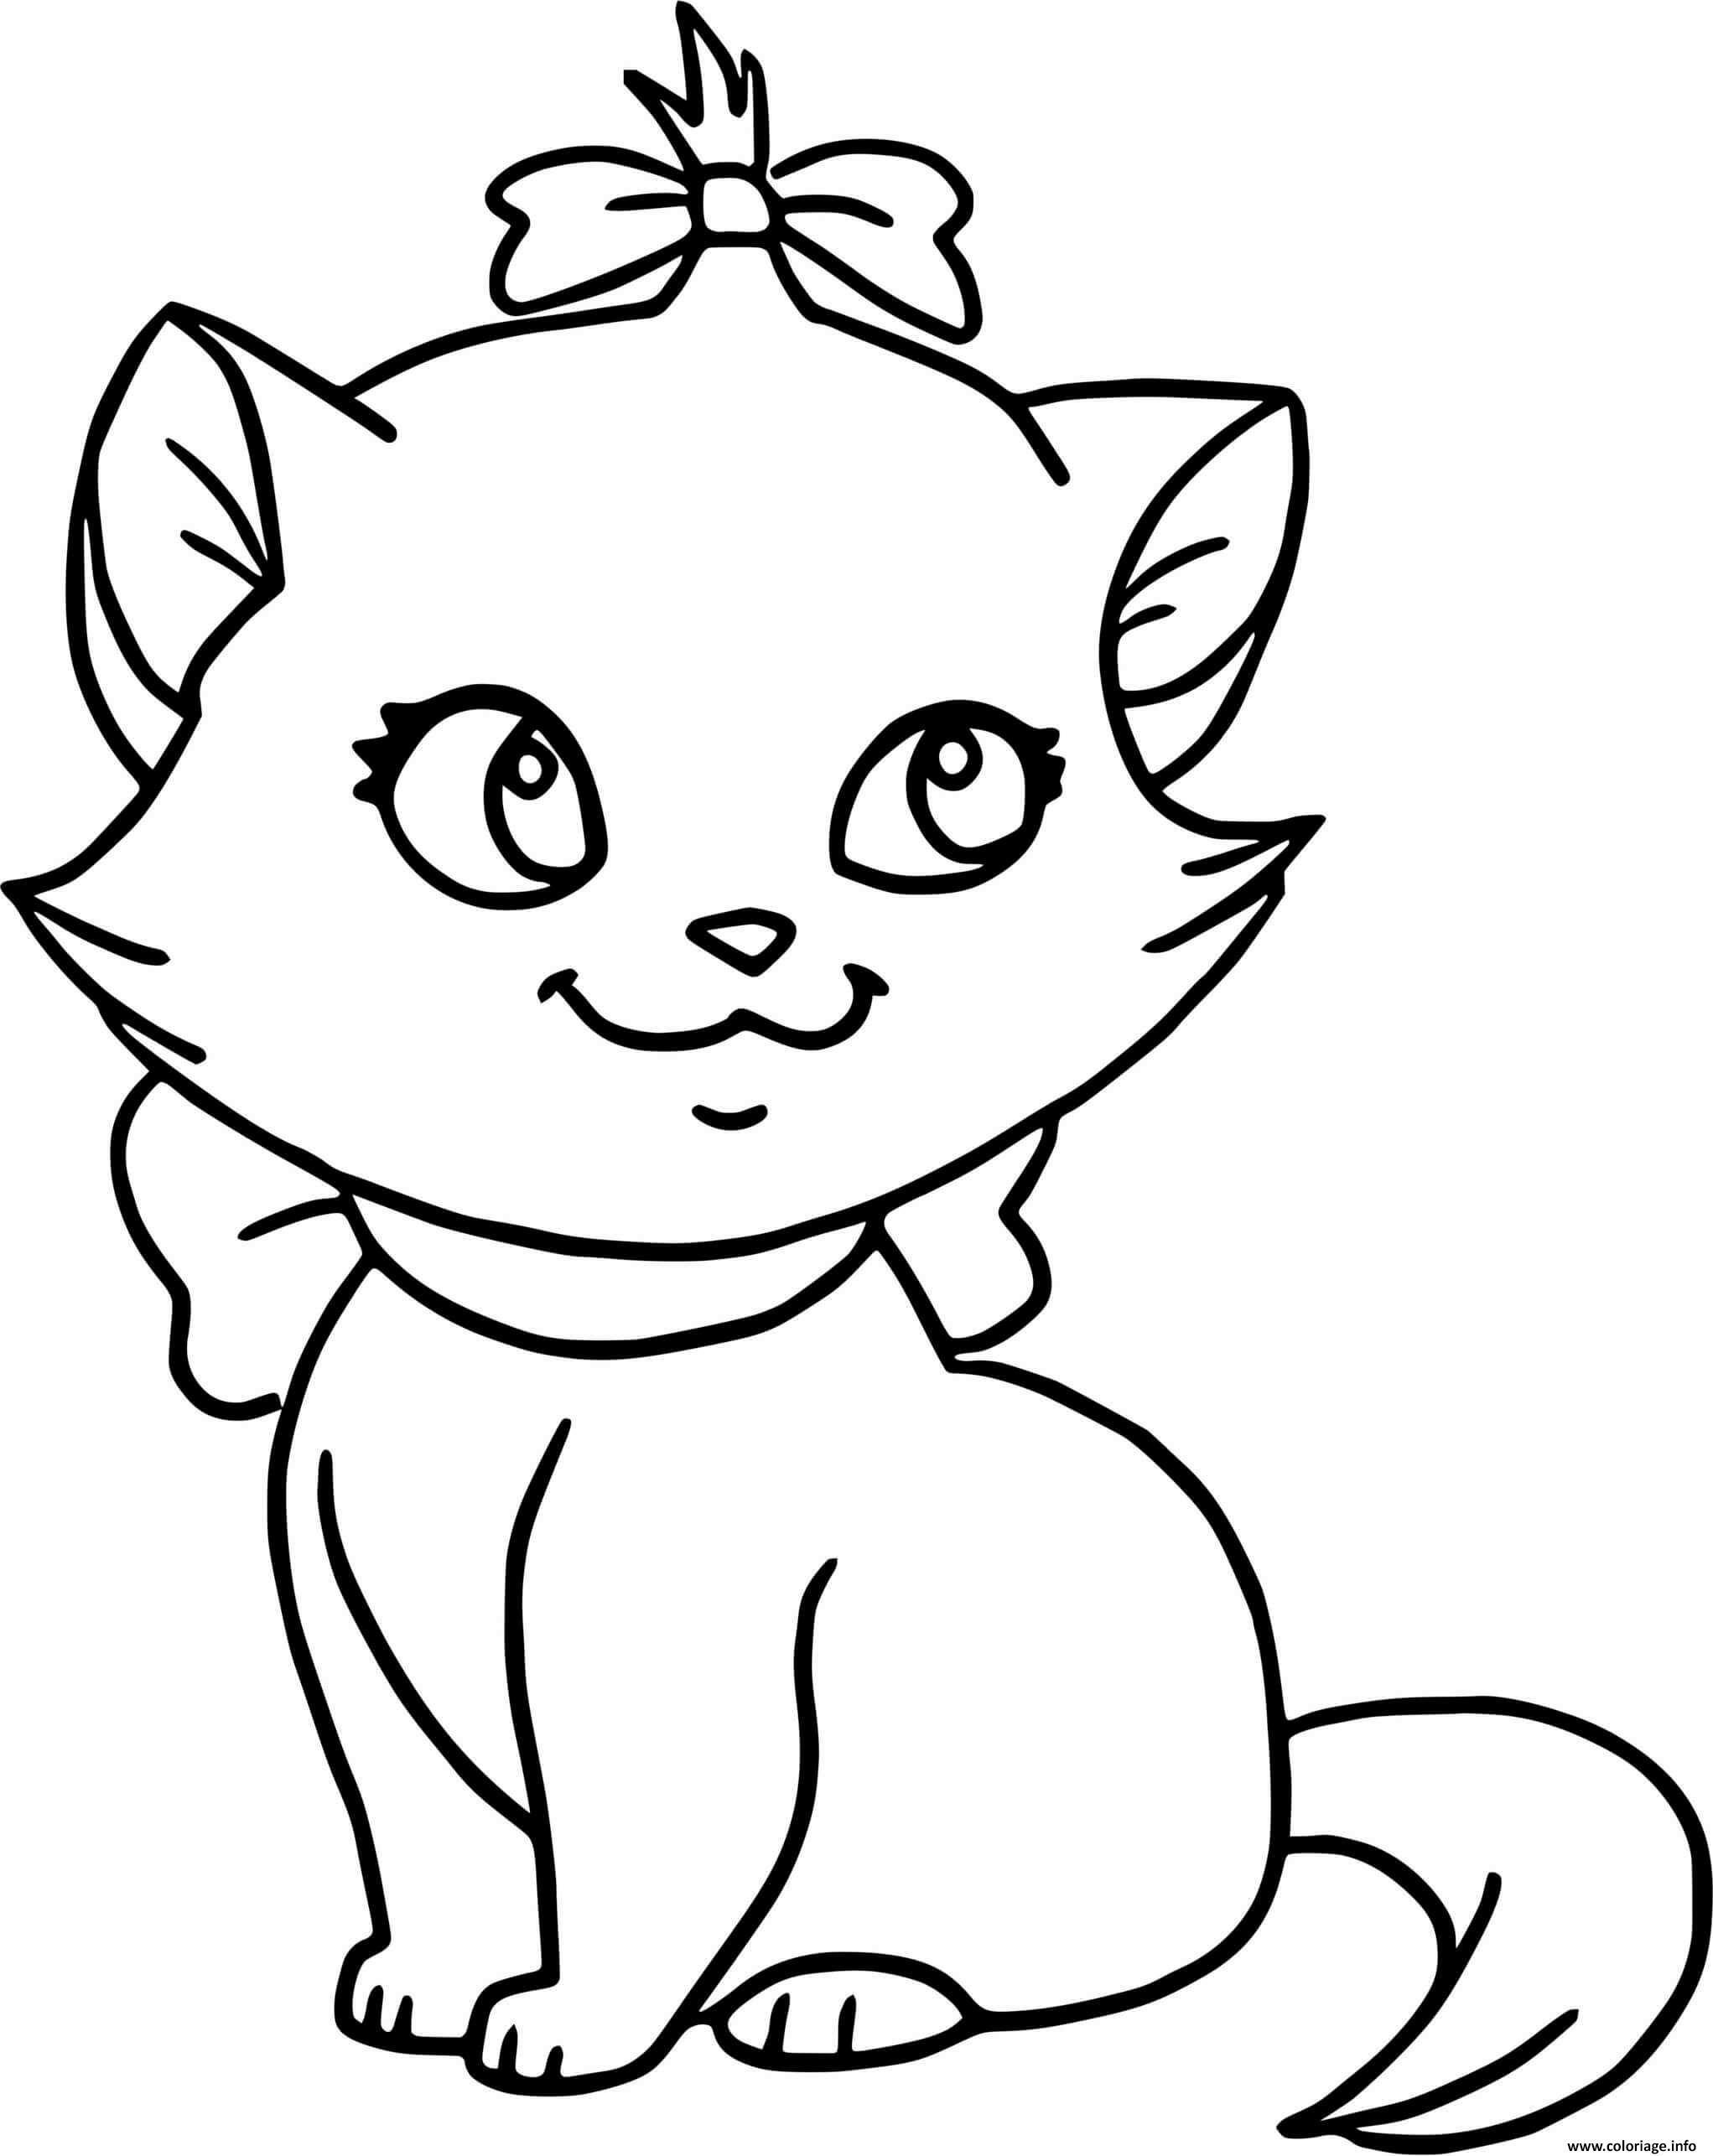 Dessin chaton facile mignon Coloriage Gratuit à Imprimer